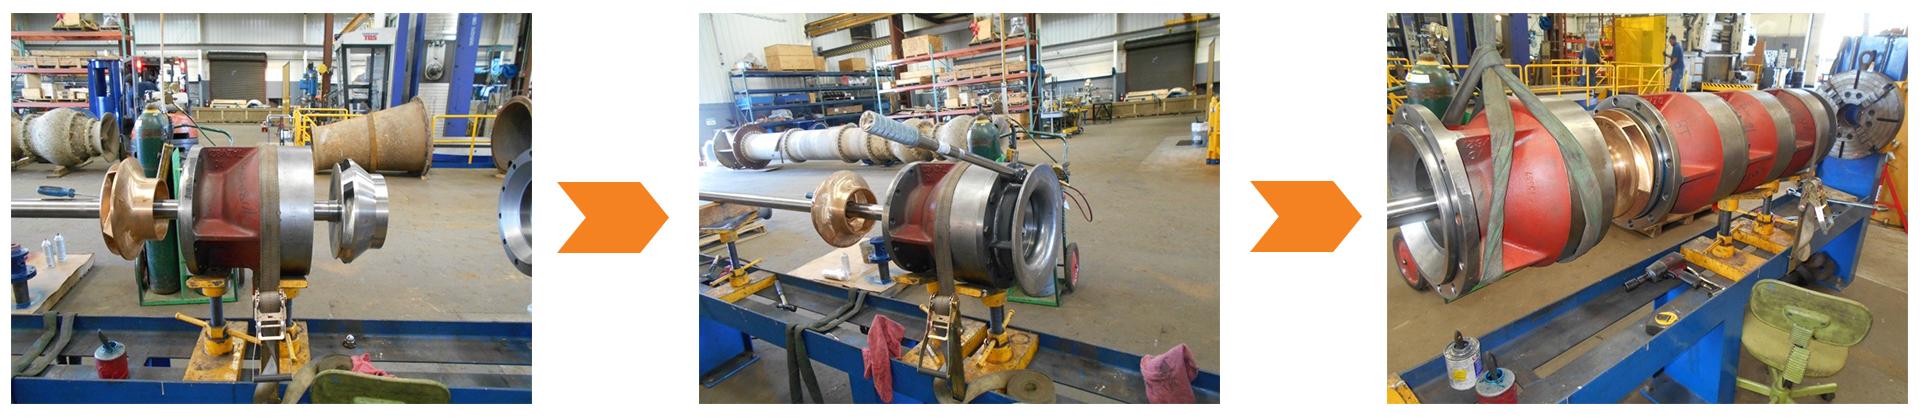 Re-bowl service for Vertical Turbine Pumps